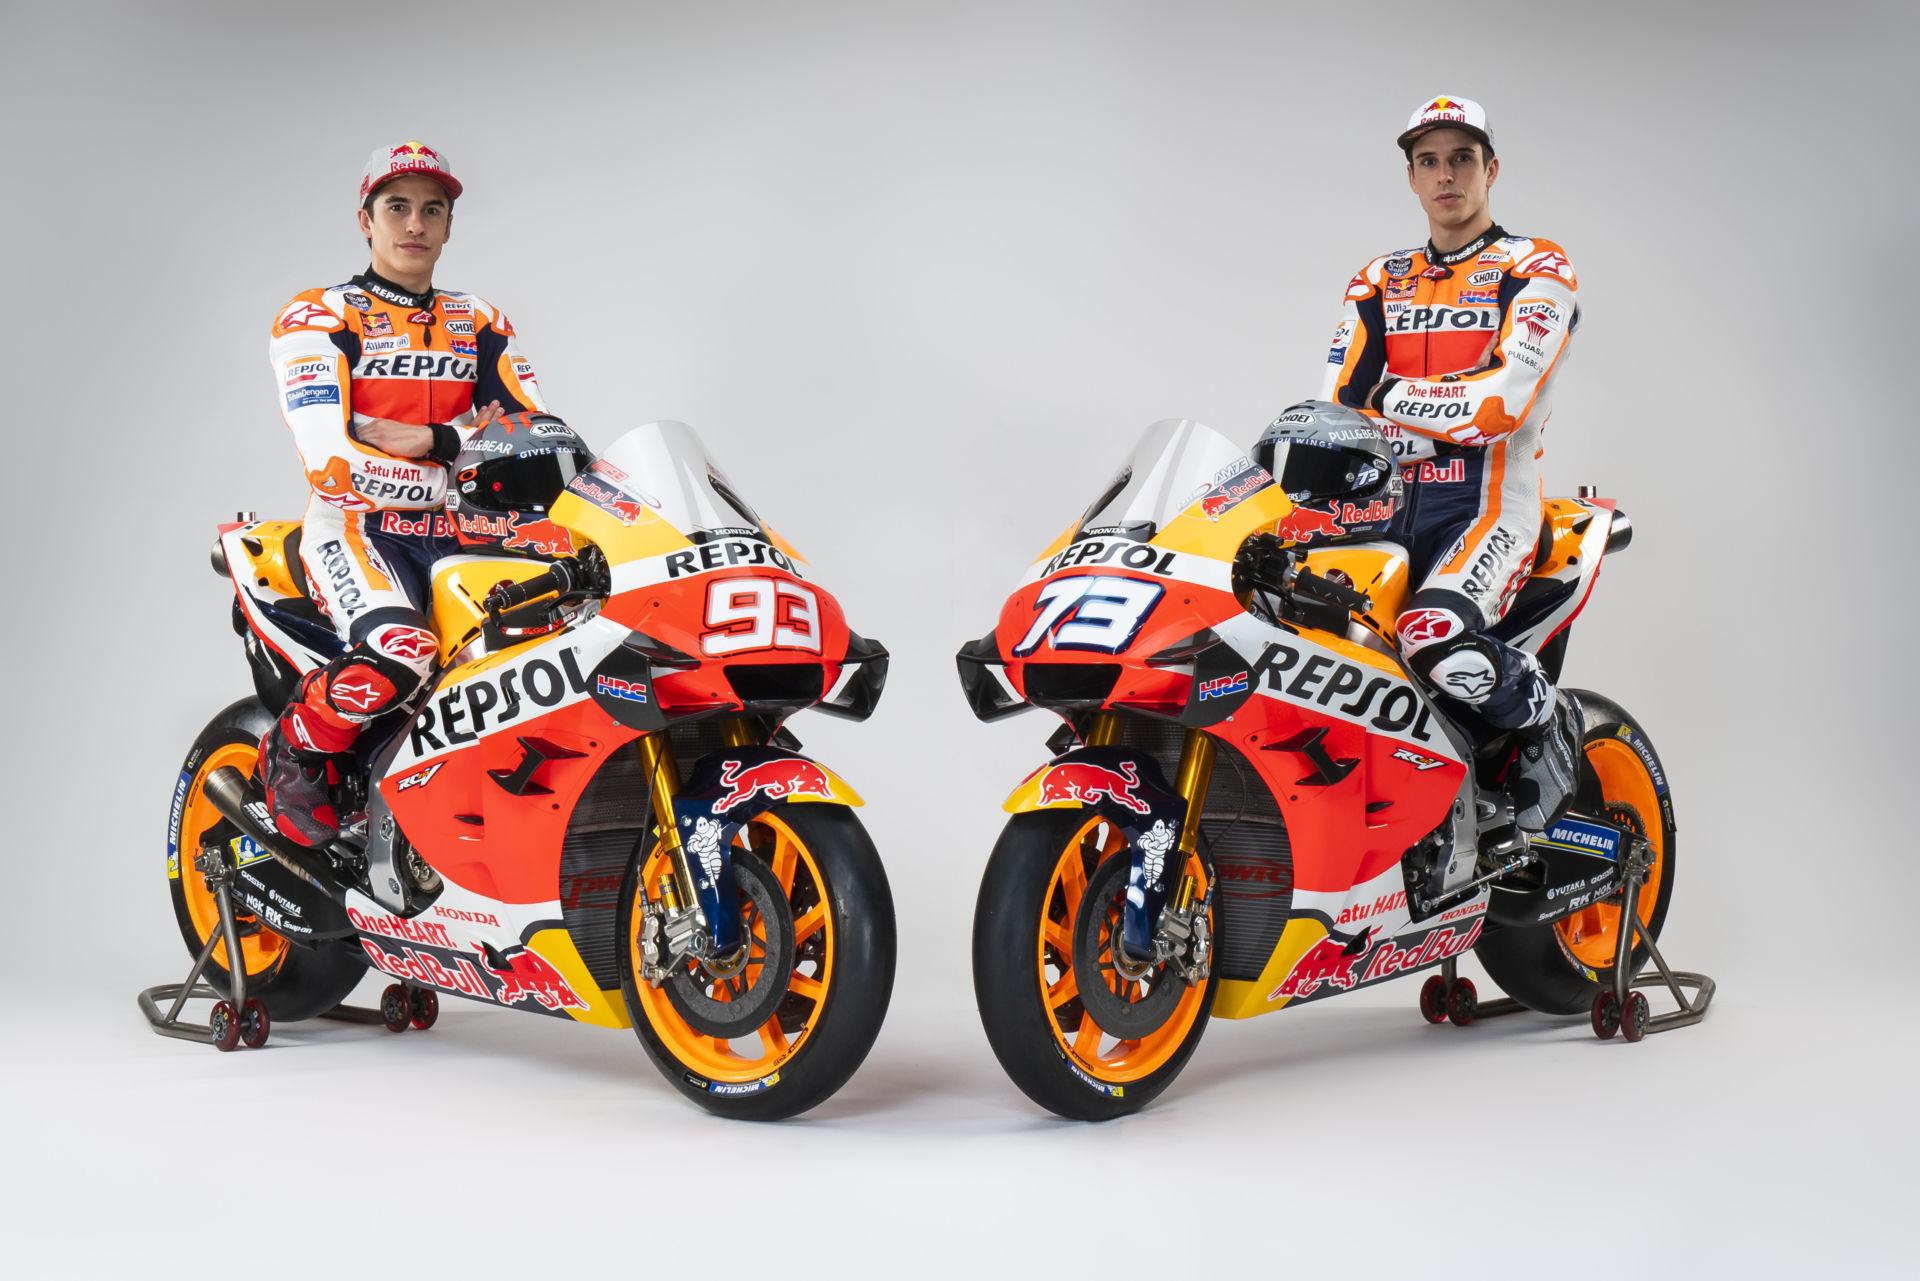 Marc Marquez (left) and Alex Marquez (right). Photo courtesy of Repsol Honda.